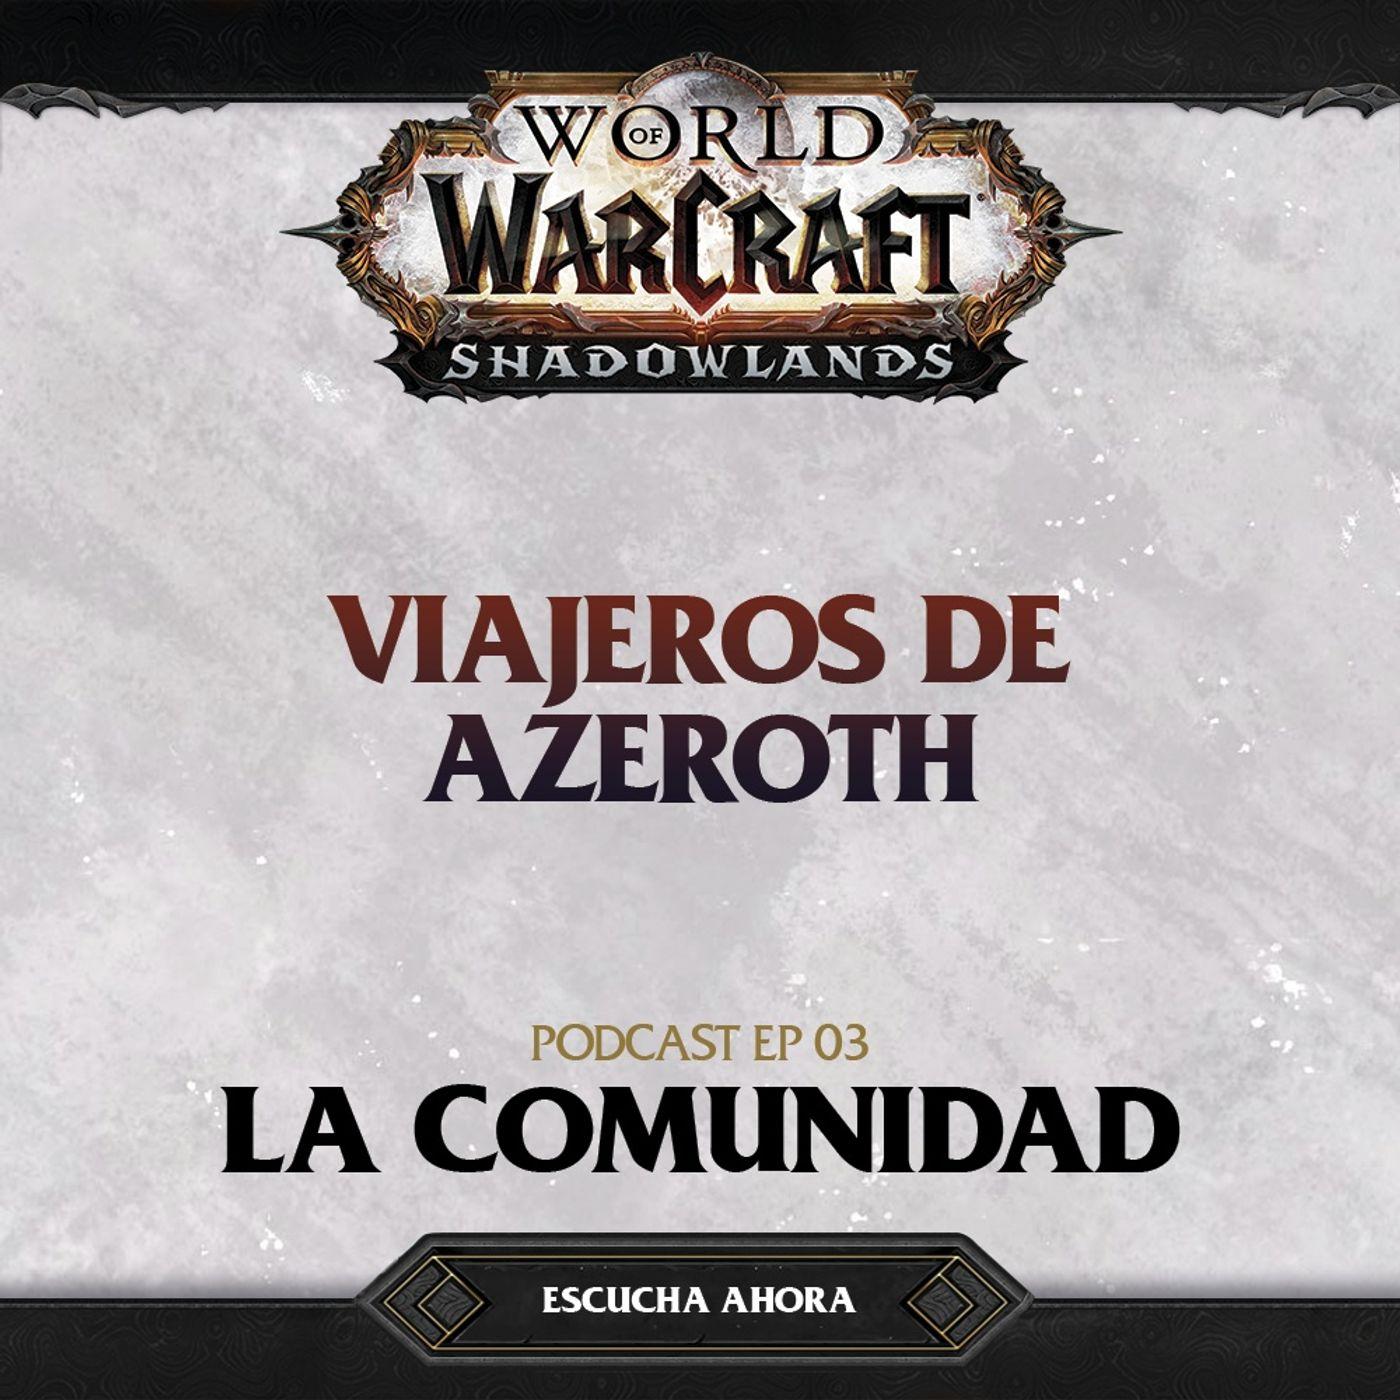 #03 - La Comunidad de World of Warcraft ft. Velissedra y Mateo Betancur